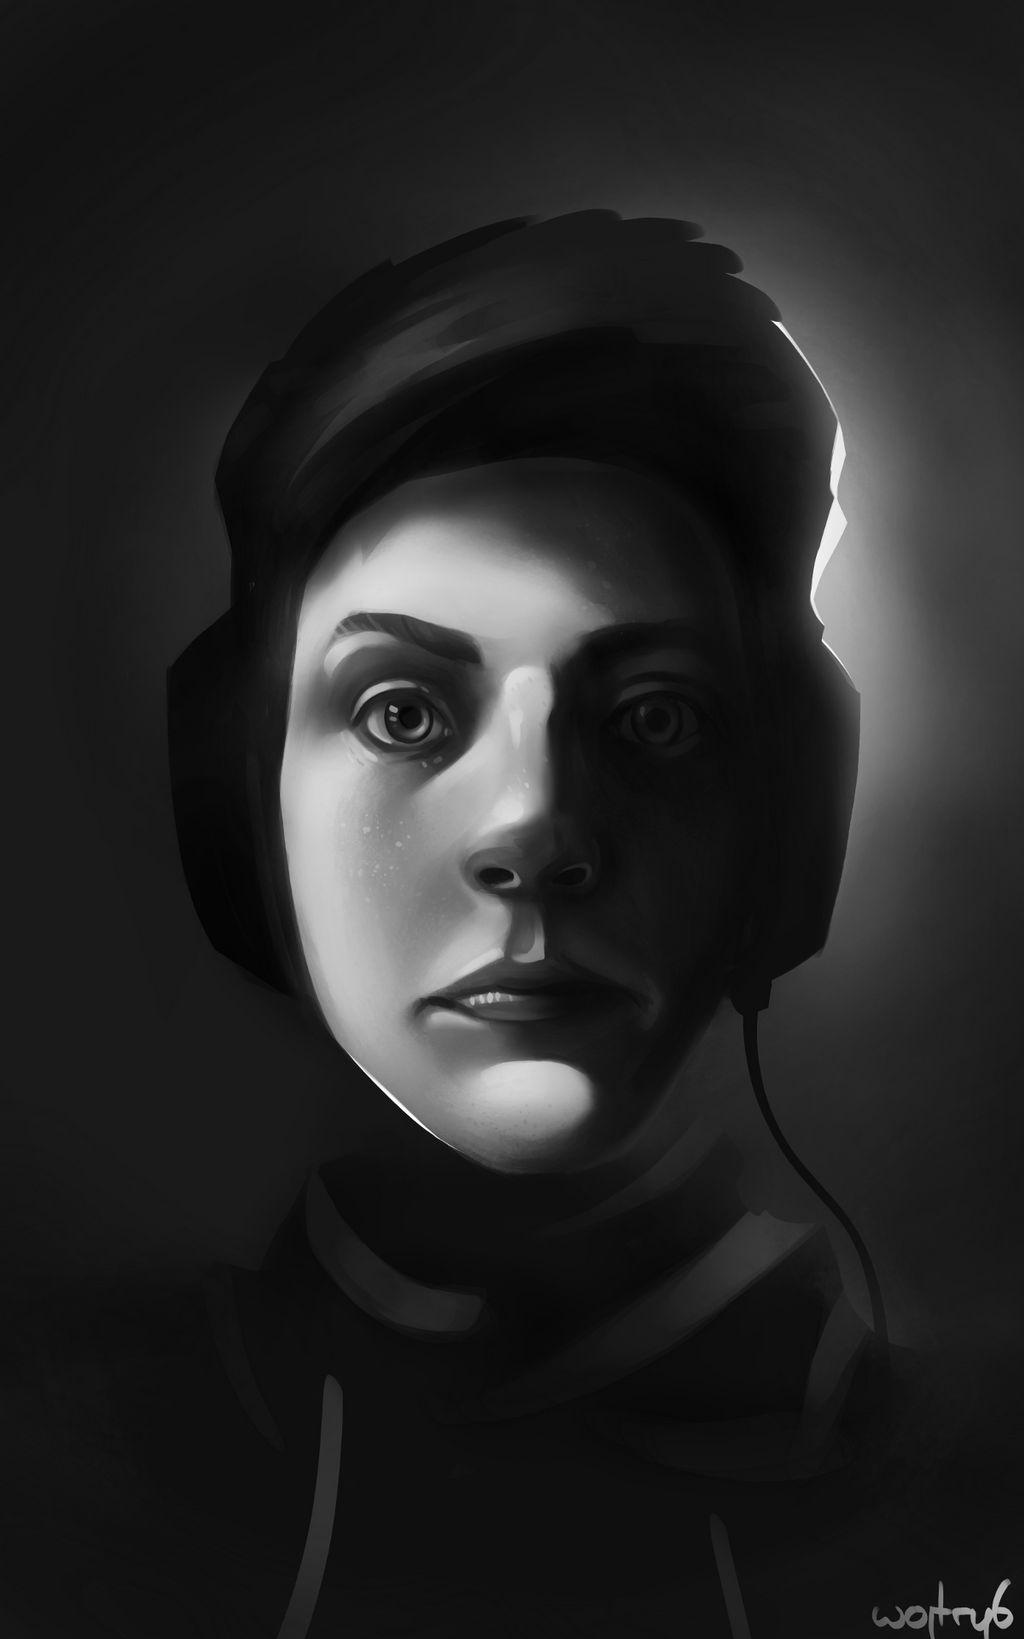 wojtryb's Profile Picture